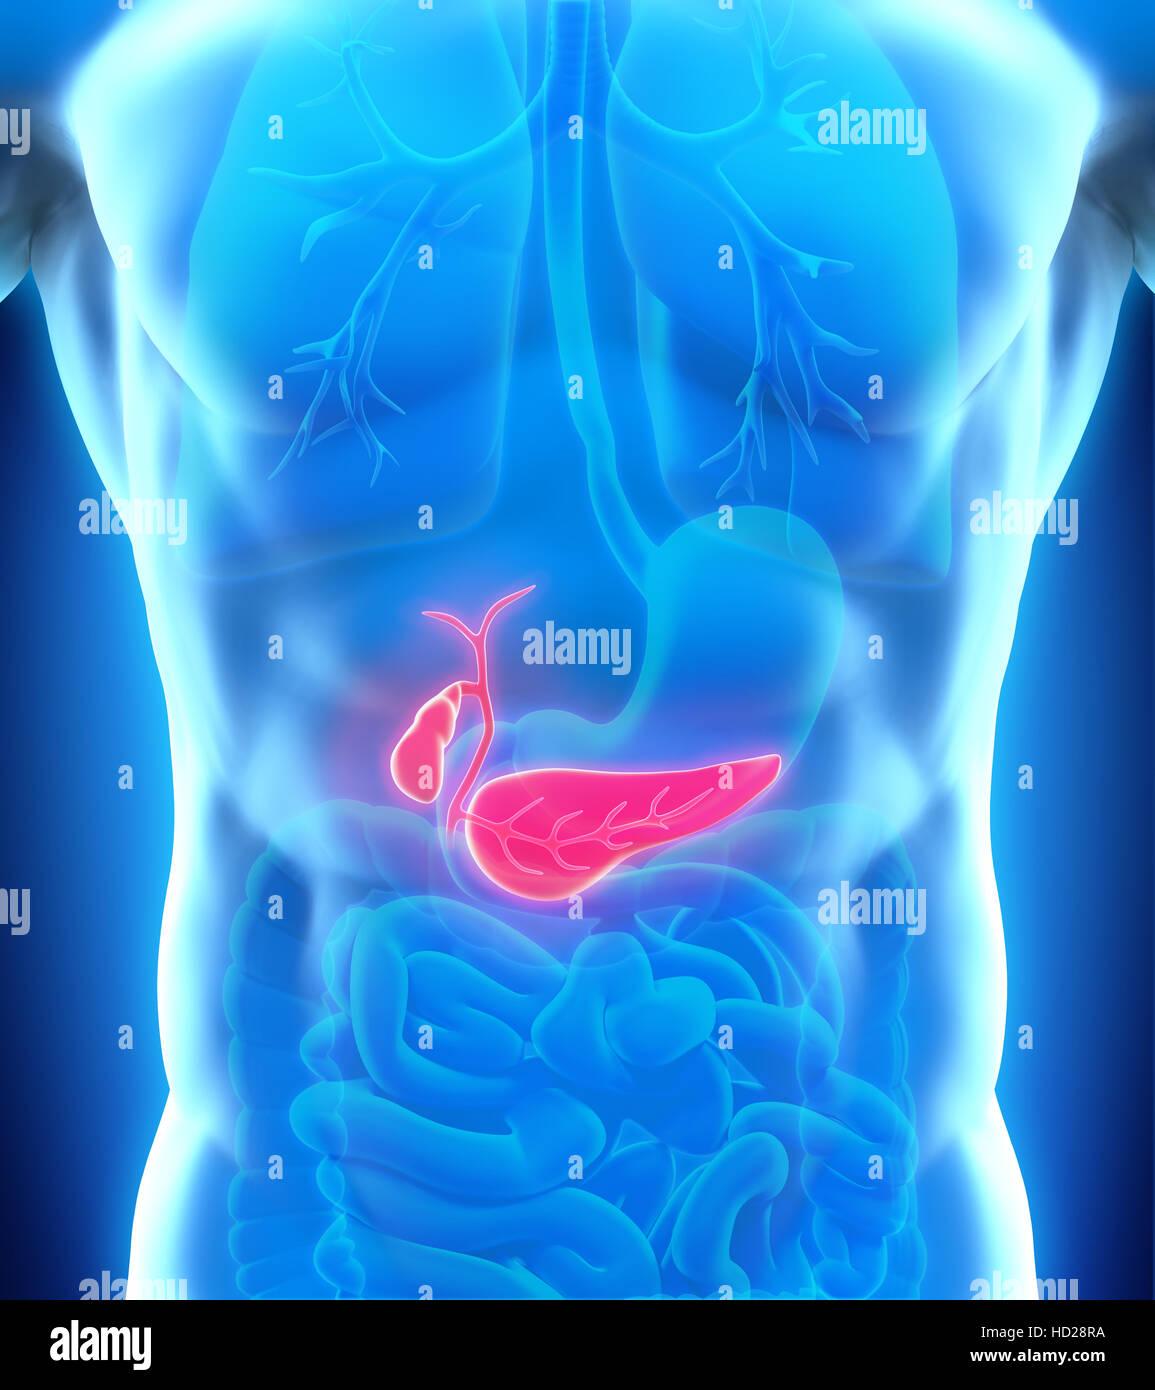 Human Gallbladder and Pancreas Anatomy Stock Photo: 128513934 - Alamy